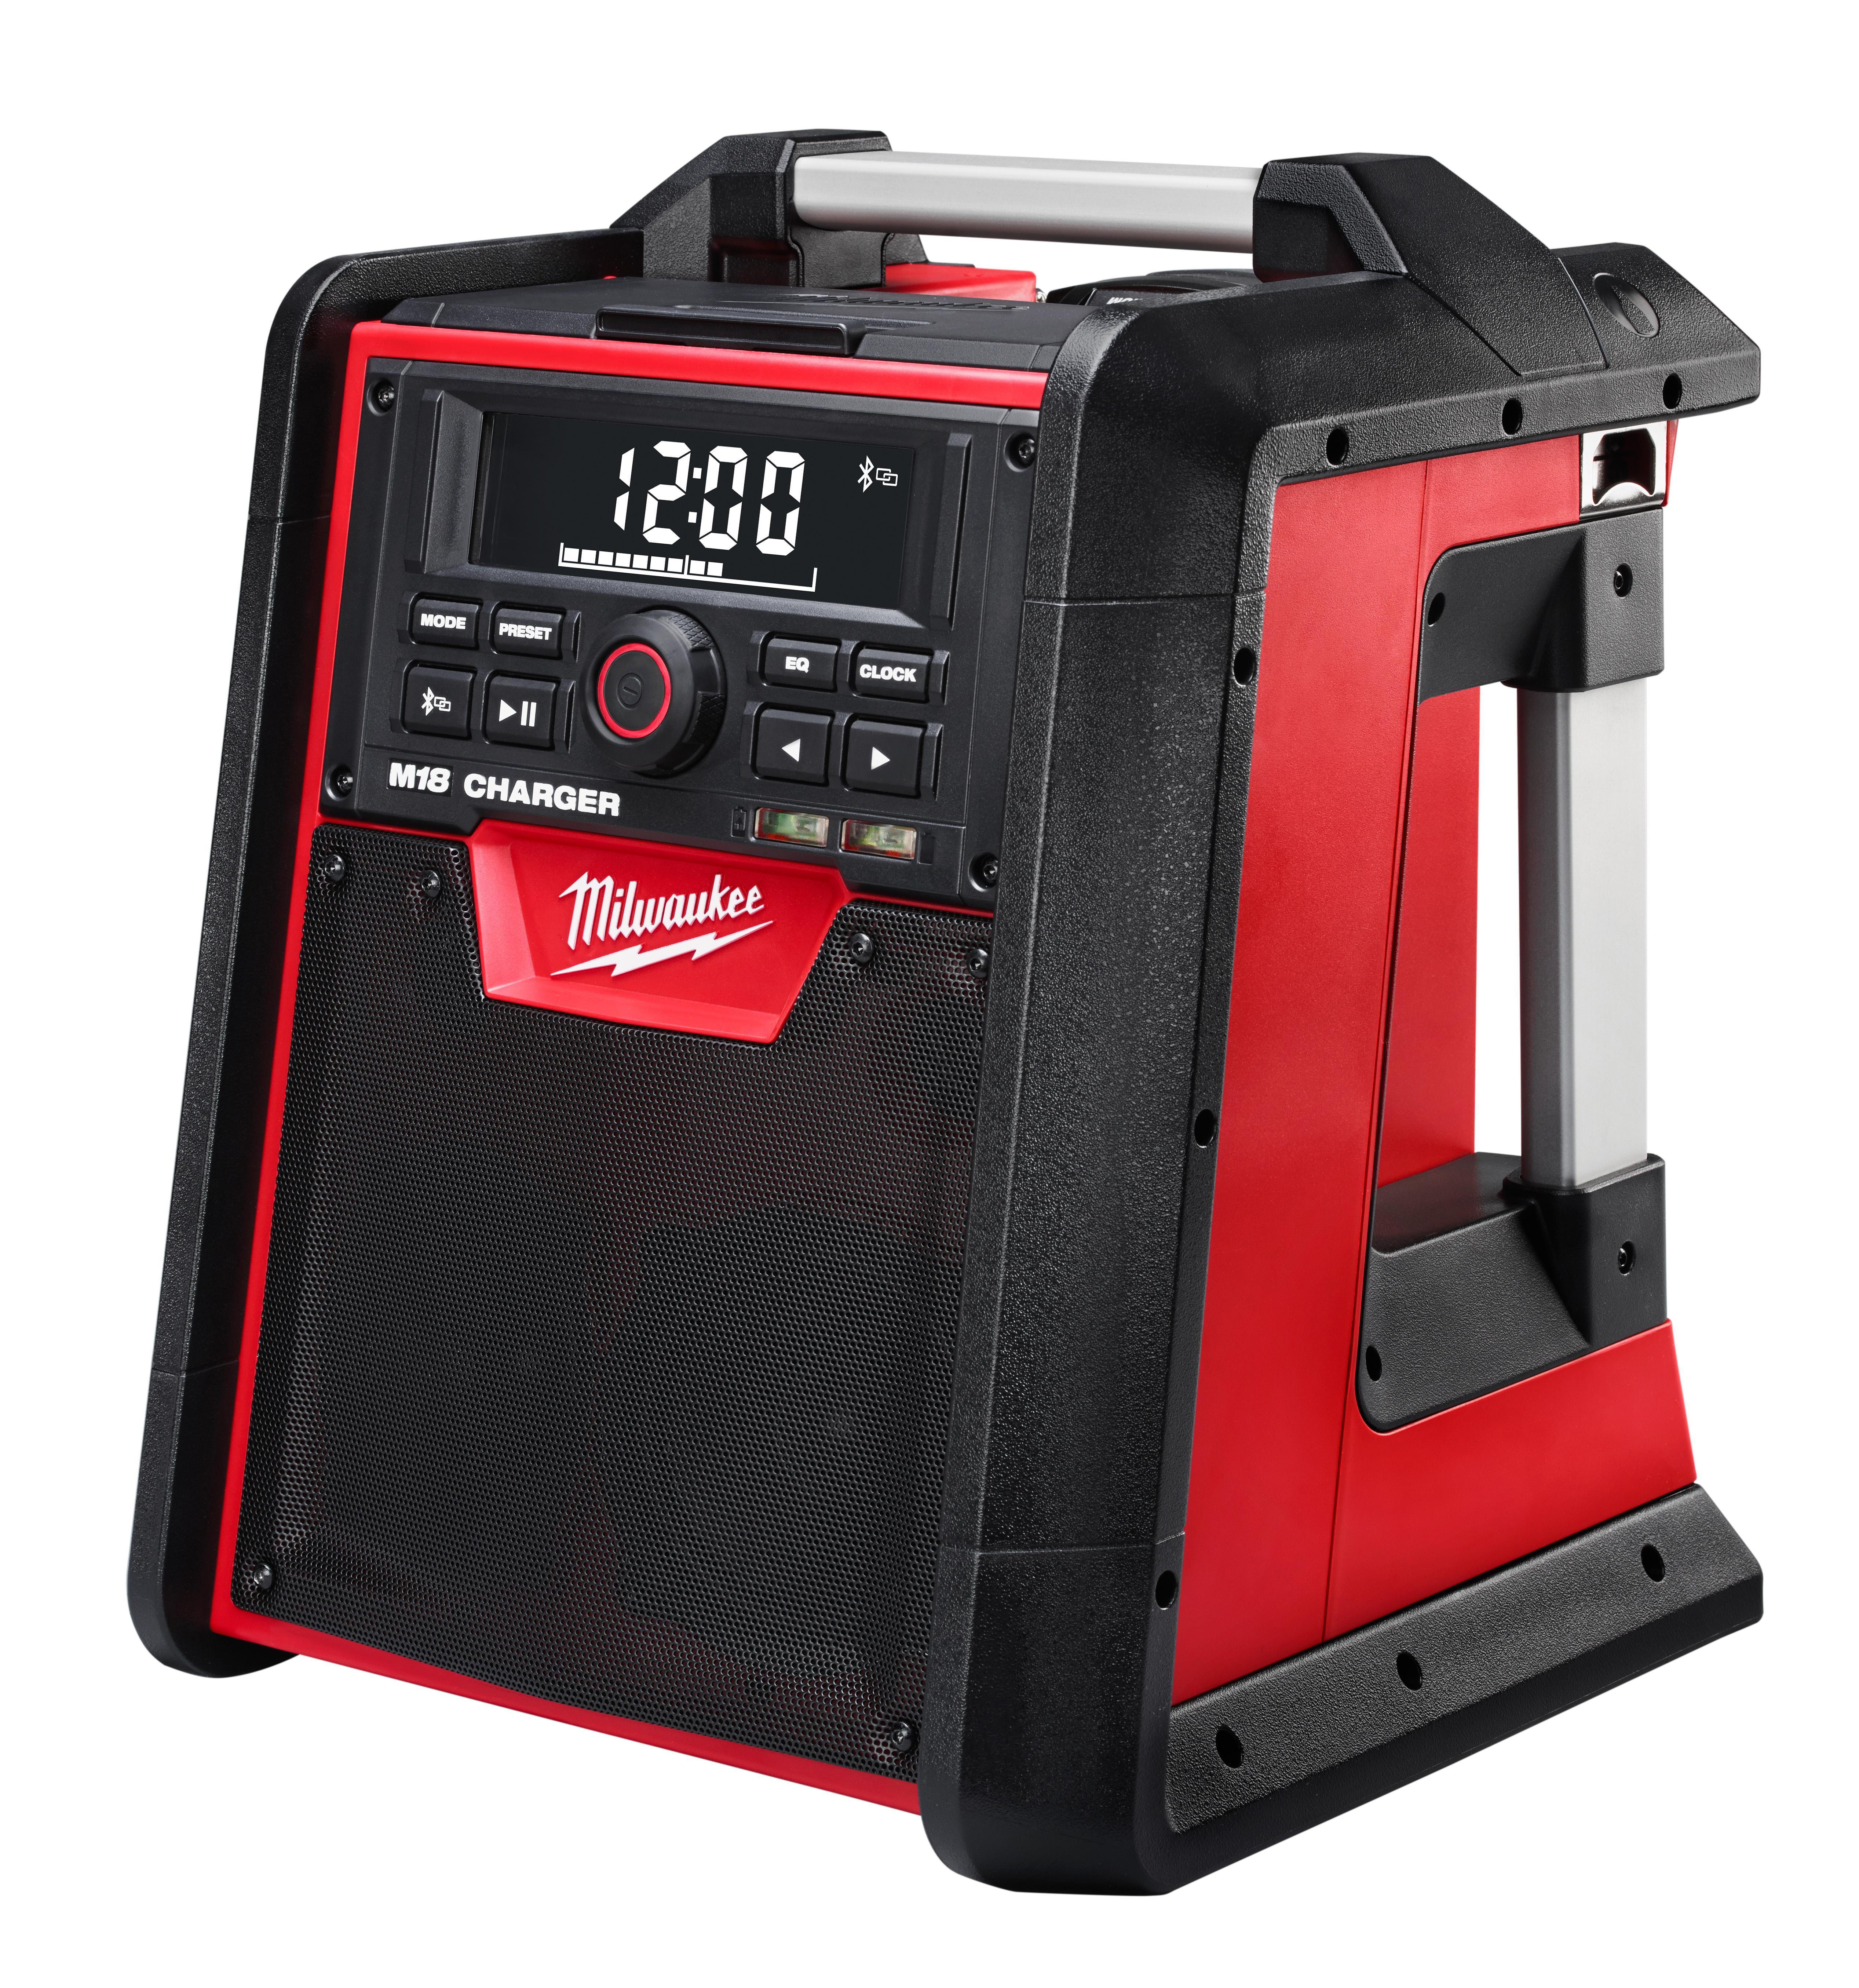 Milwaukee® M18™ 2792-20 Jobsite Radio/Charger, 18 VDC, Lithium-Ion Battery